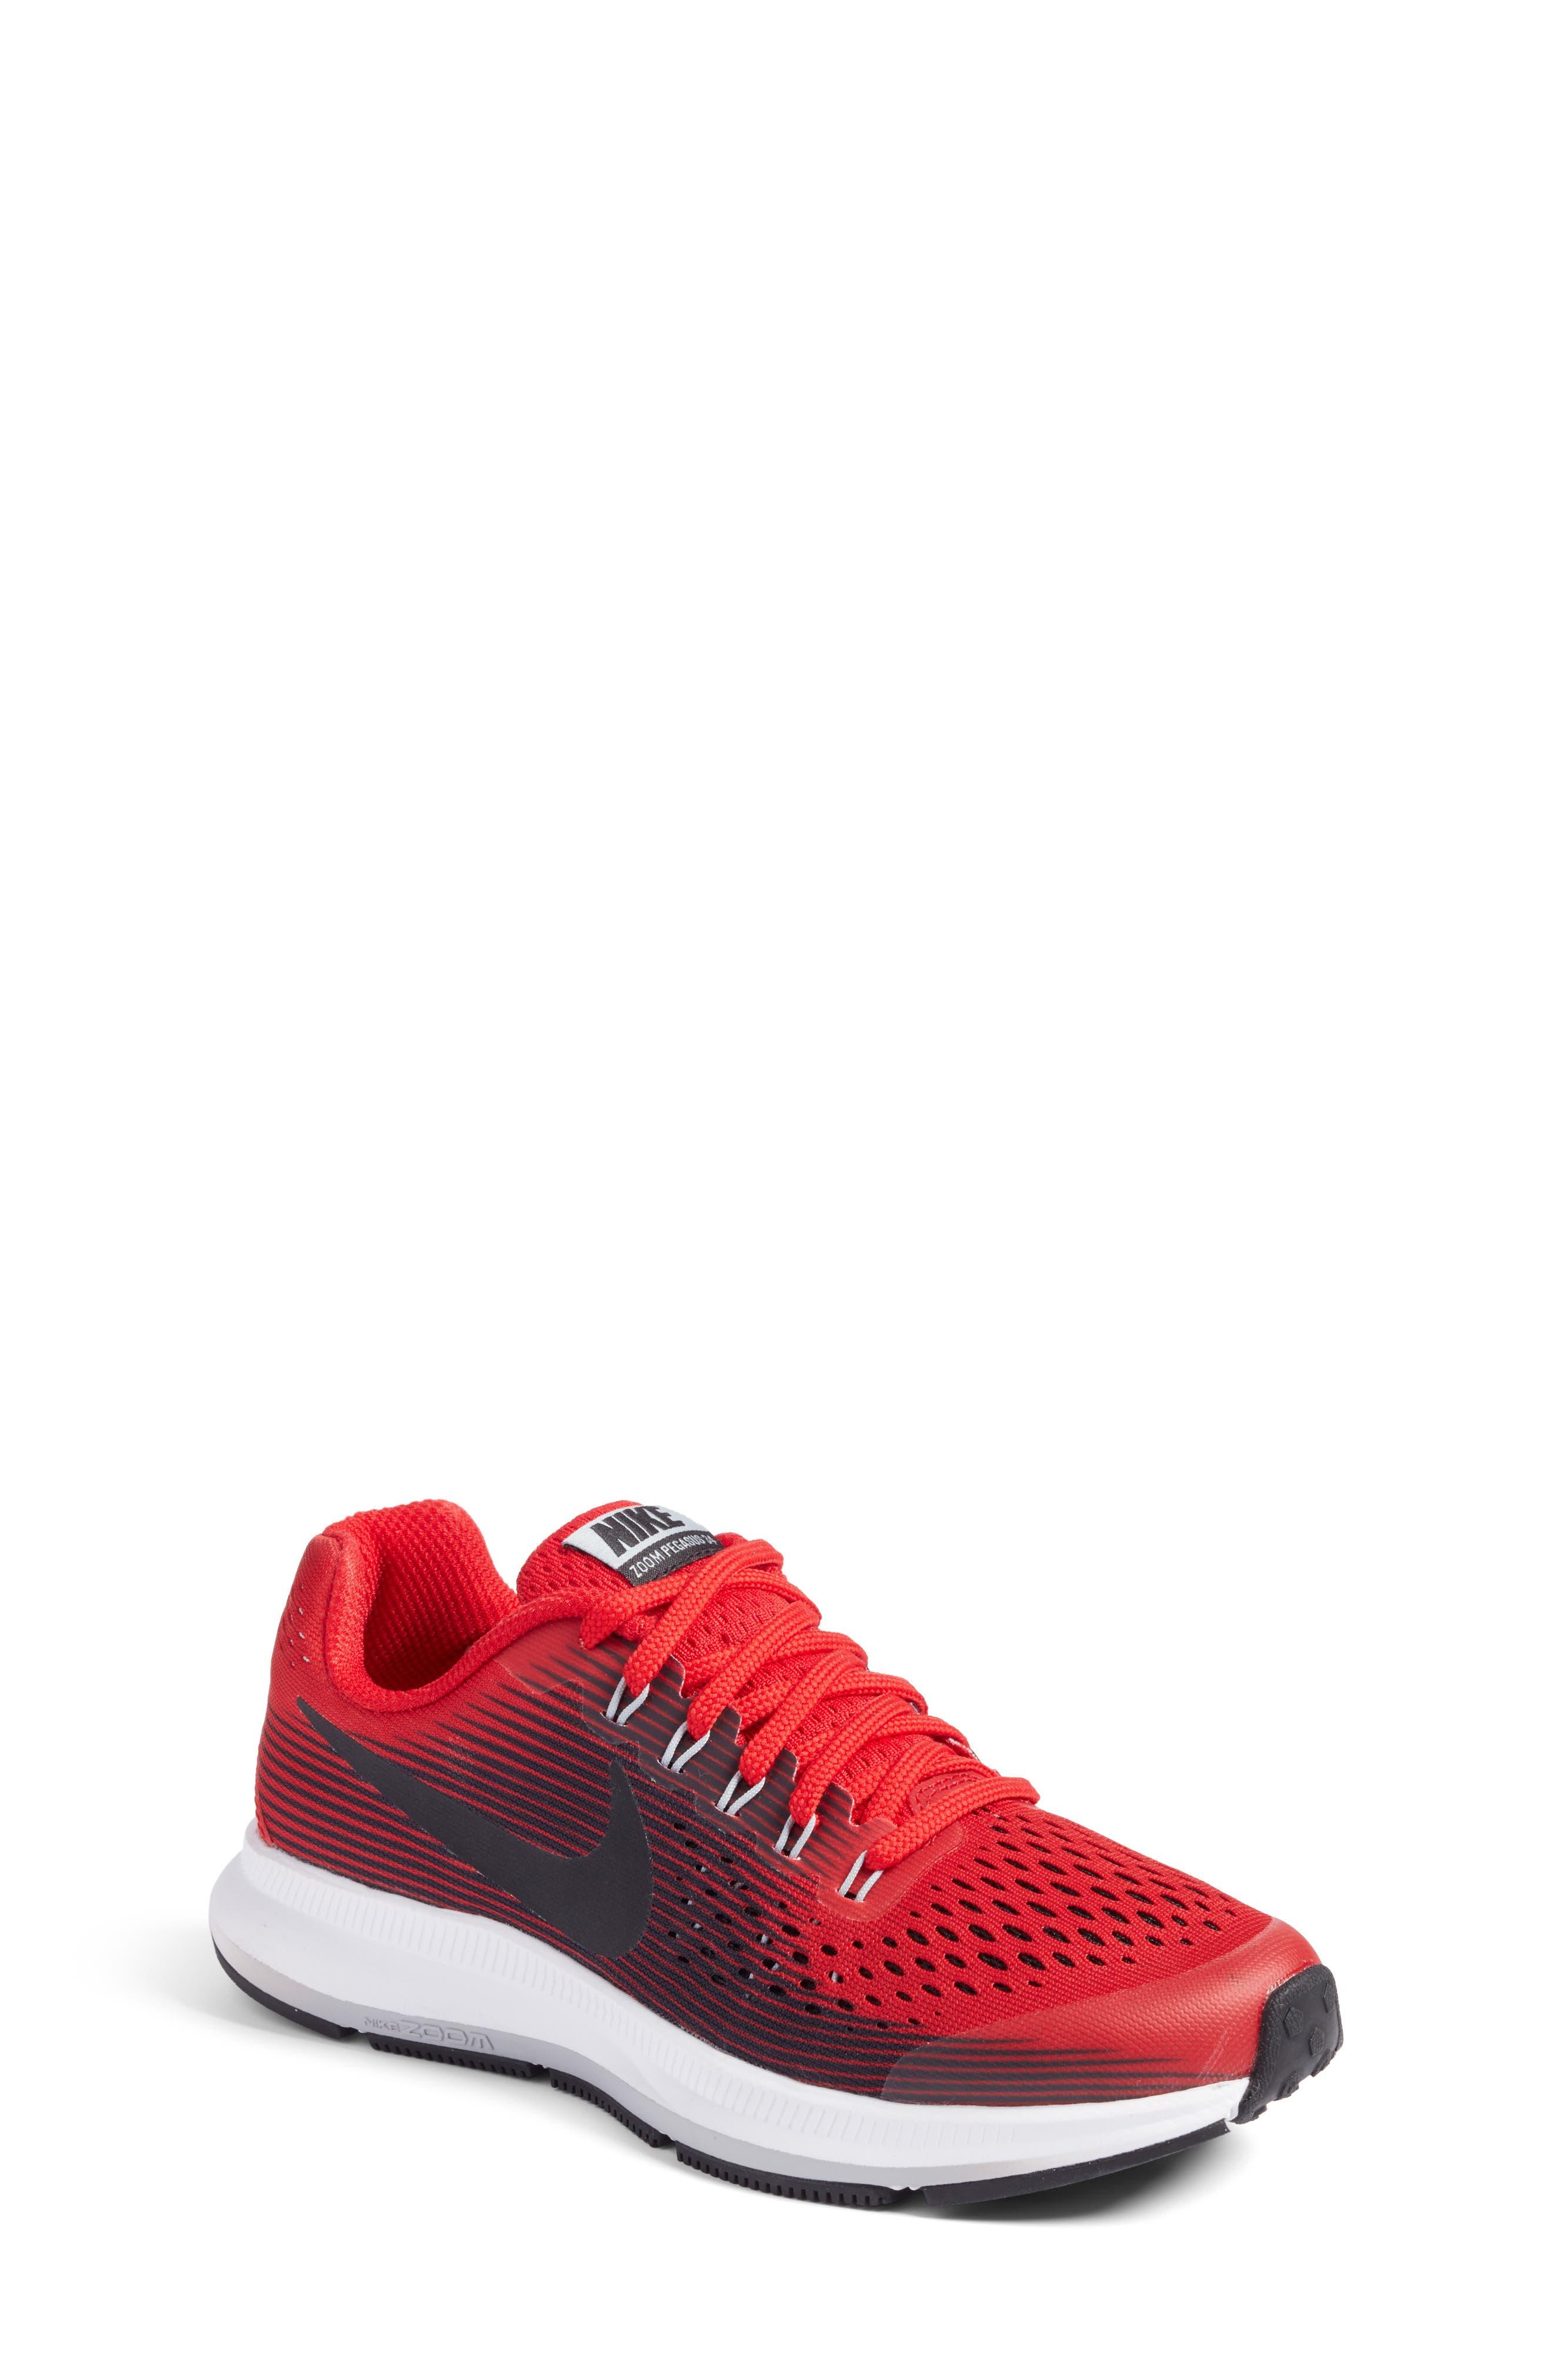 NIKE Zoom Pegasus 34 Sneaker